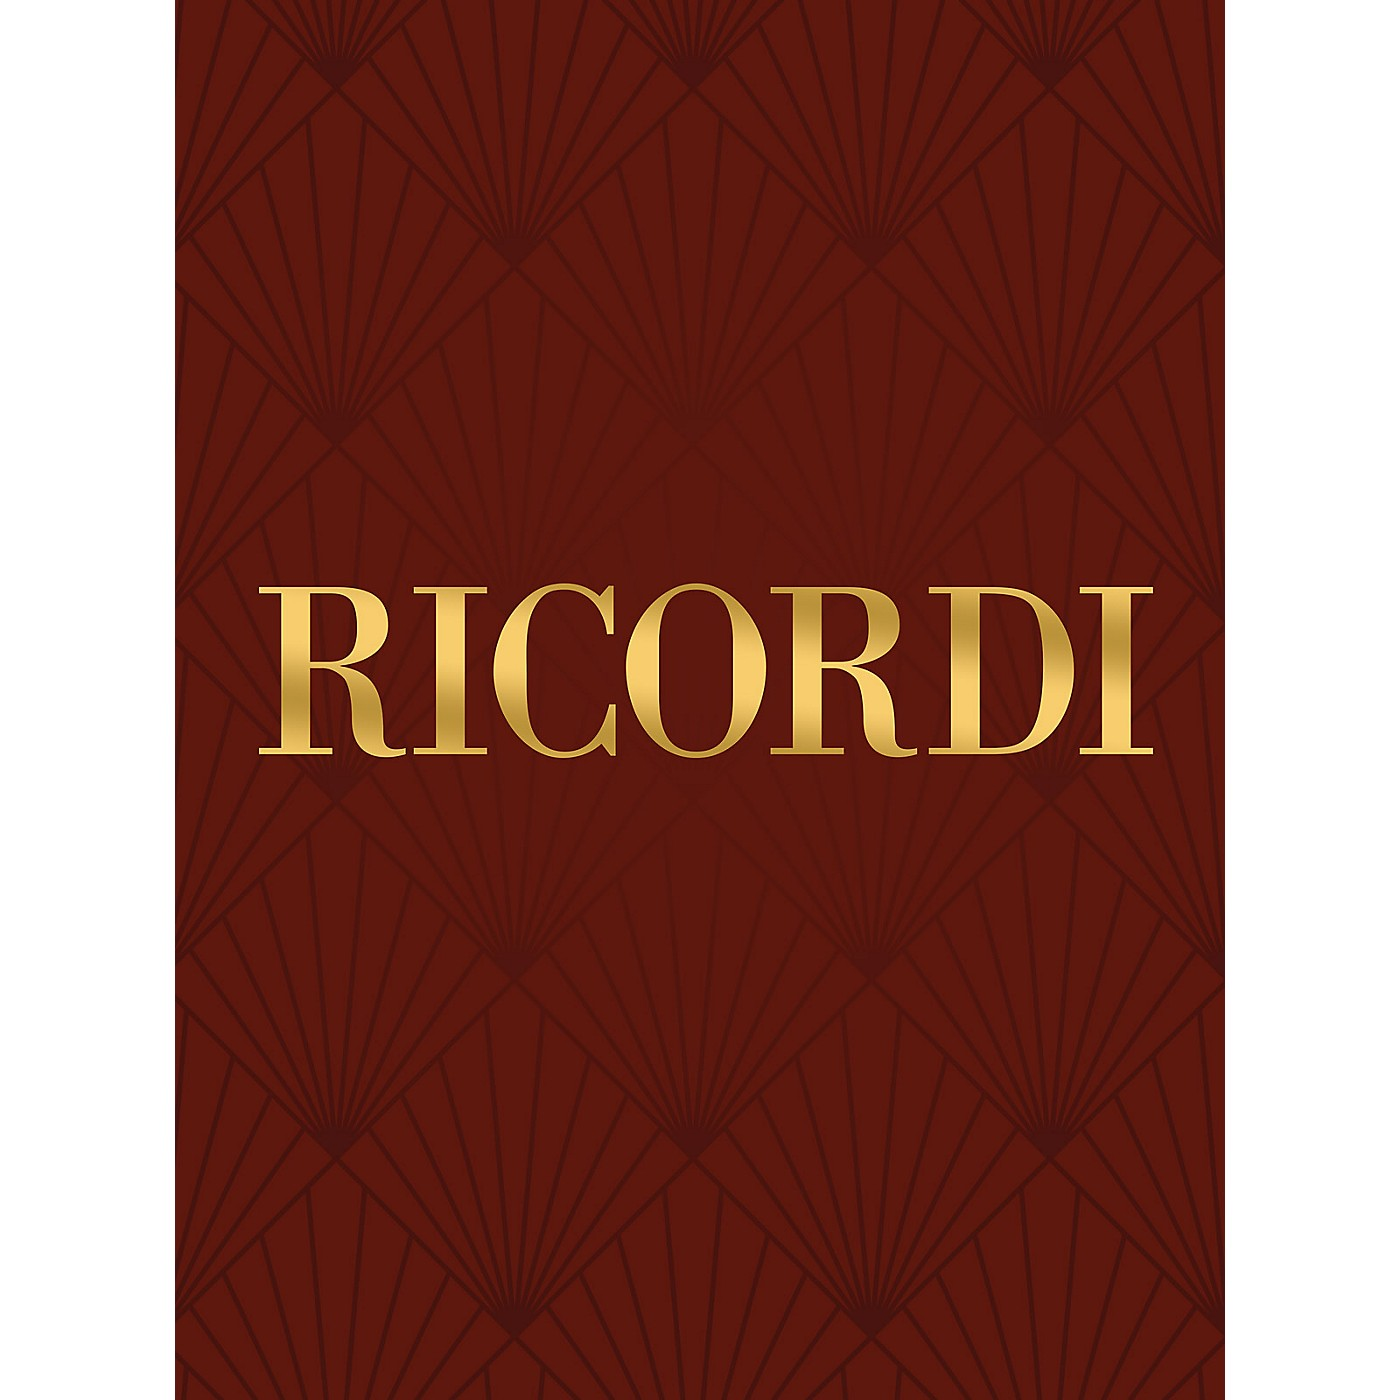 Ricordi Nulla in mundo pax sincera RV630 Study Score Series Composed by Antonio Vivaldi Edited by Paul Everett thumbnail